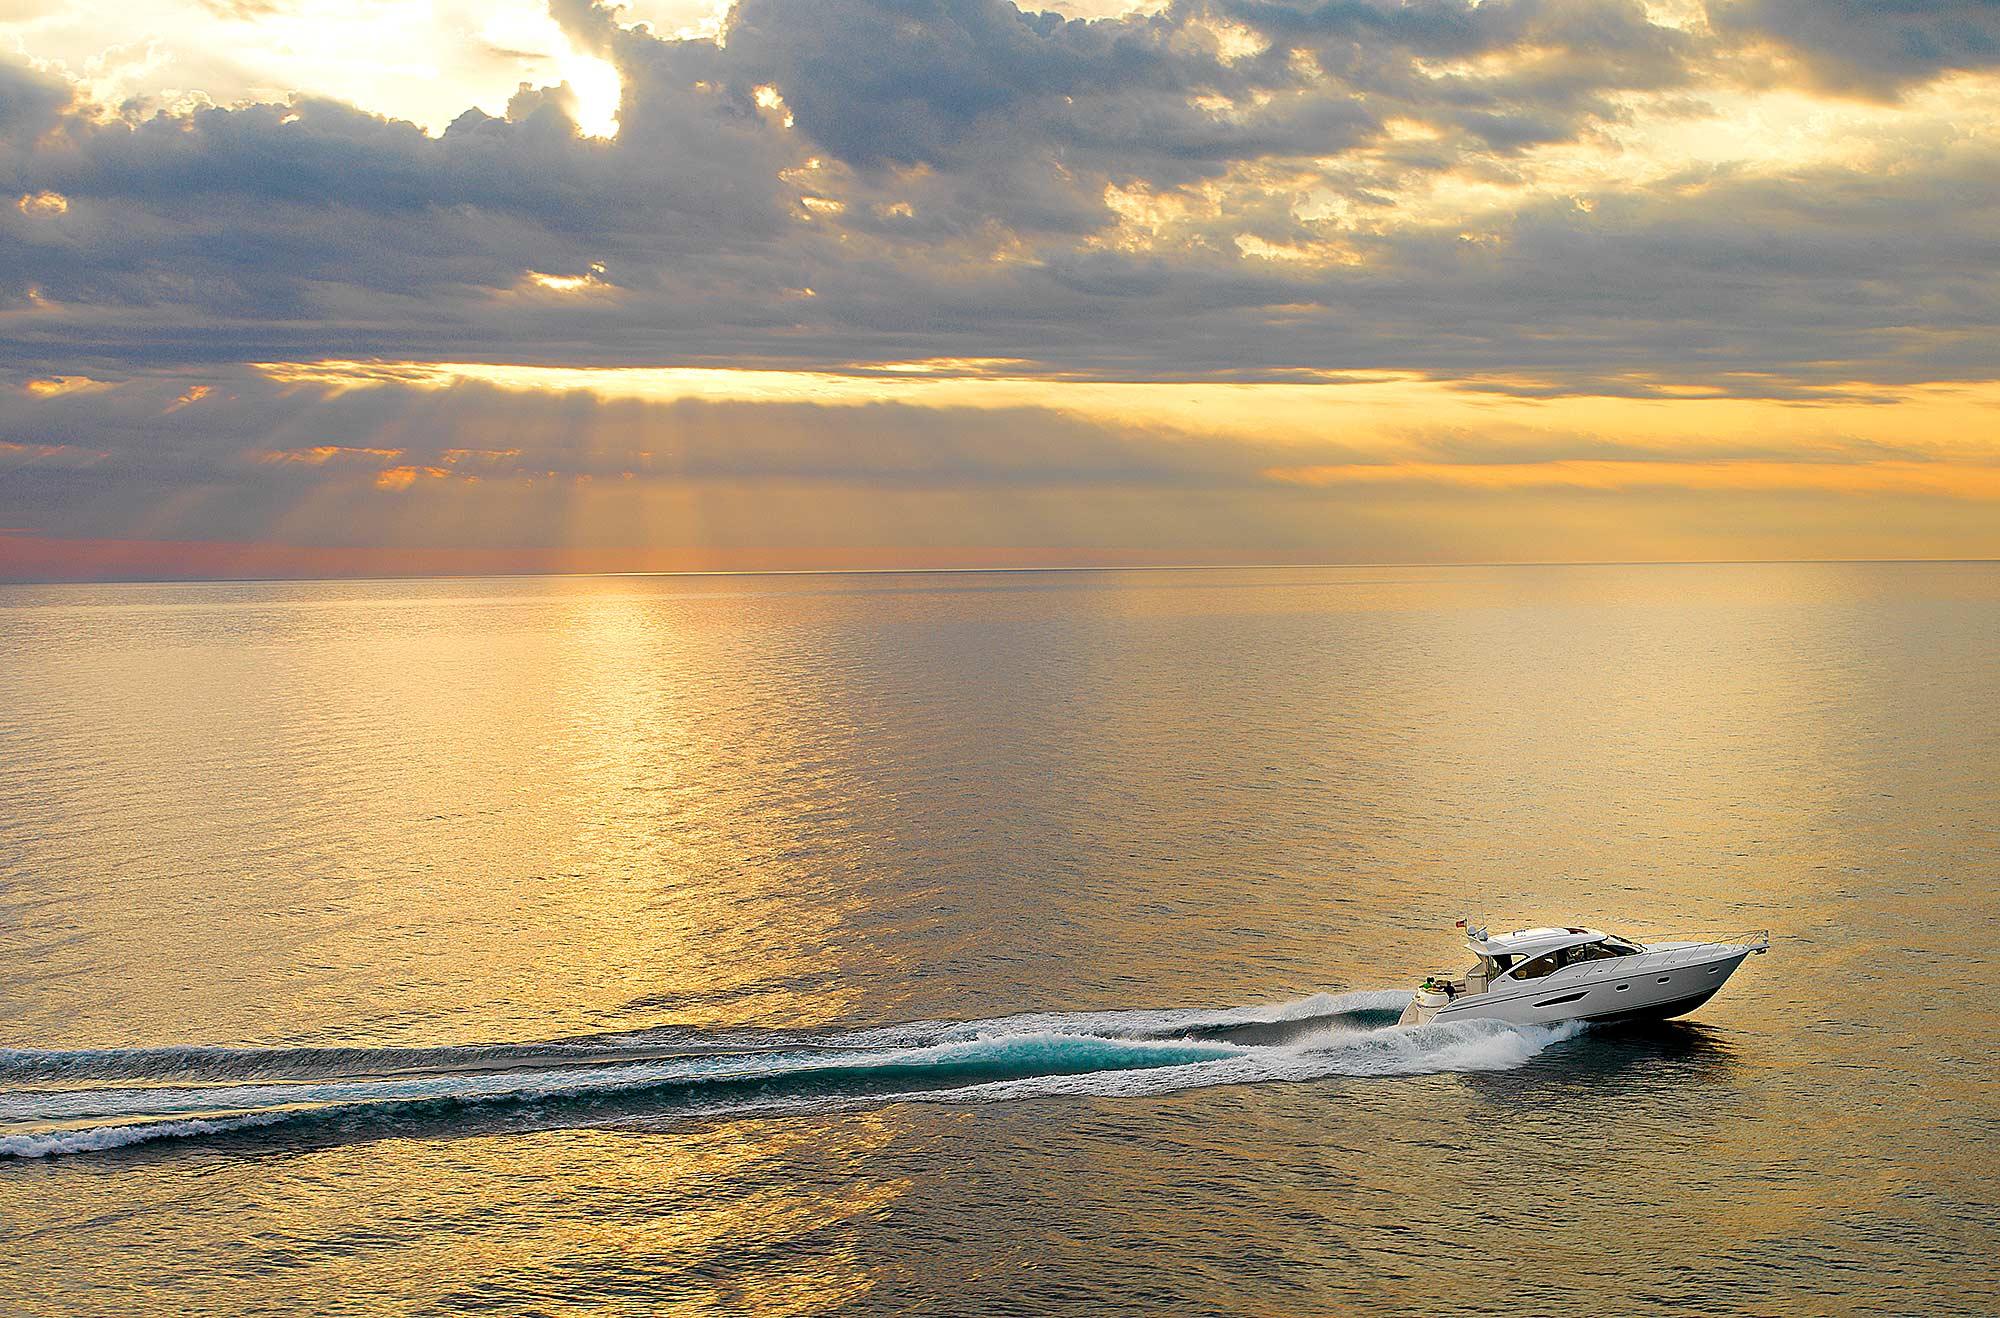 Jeremy-Frechette-tiara-yachts-sunset-home-005.jpg